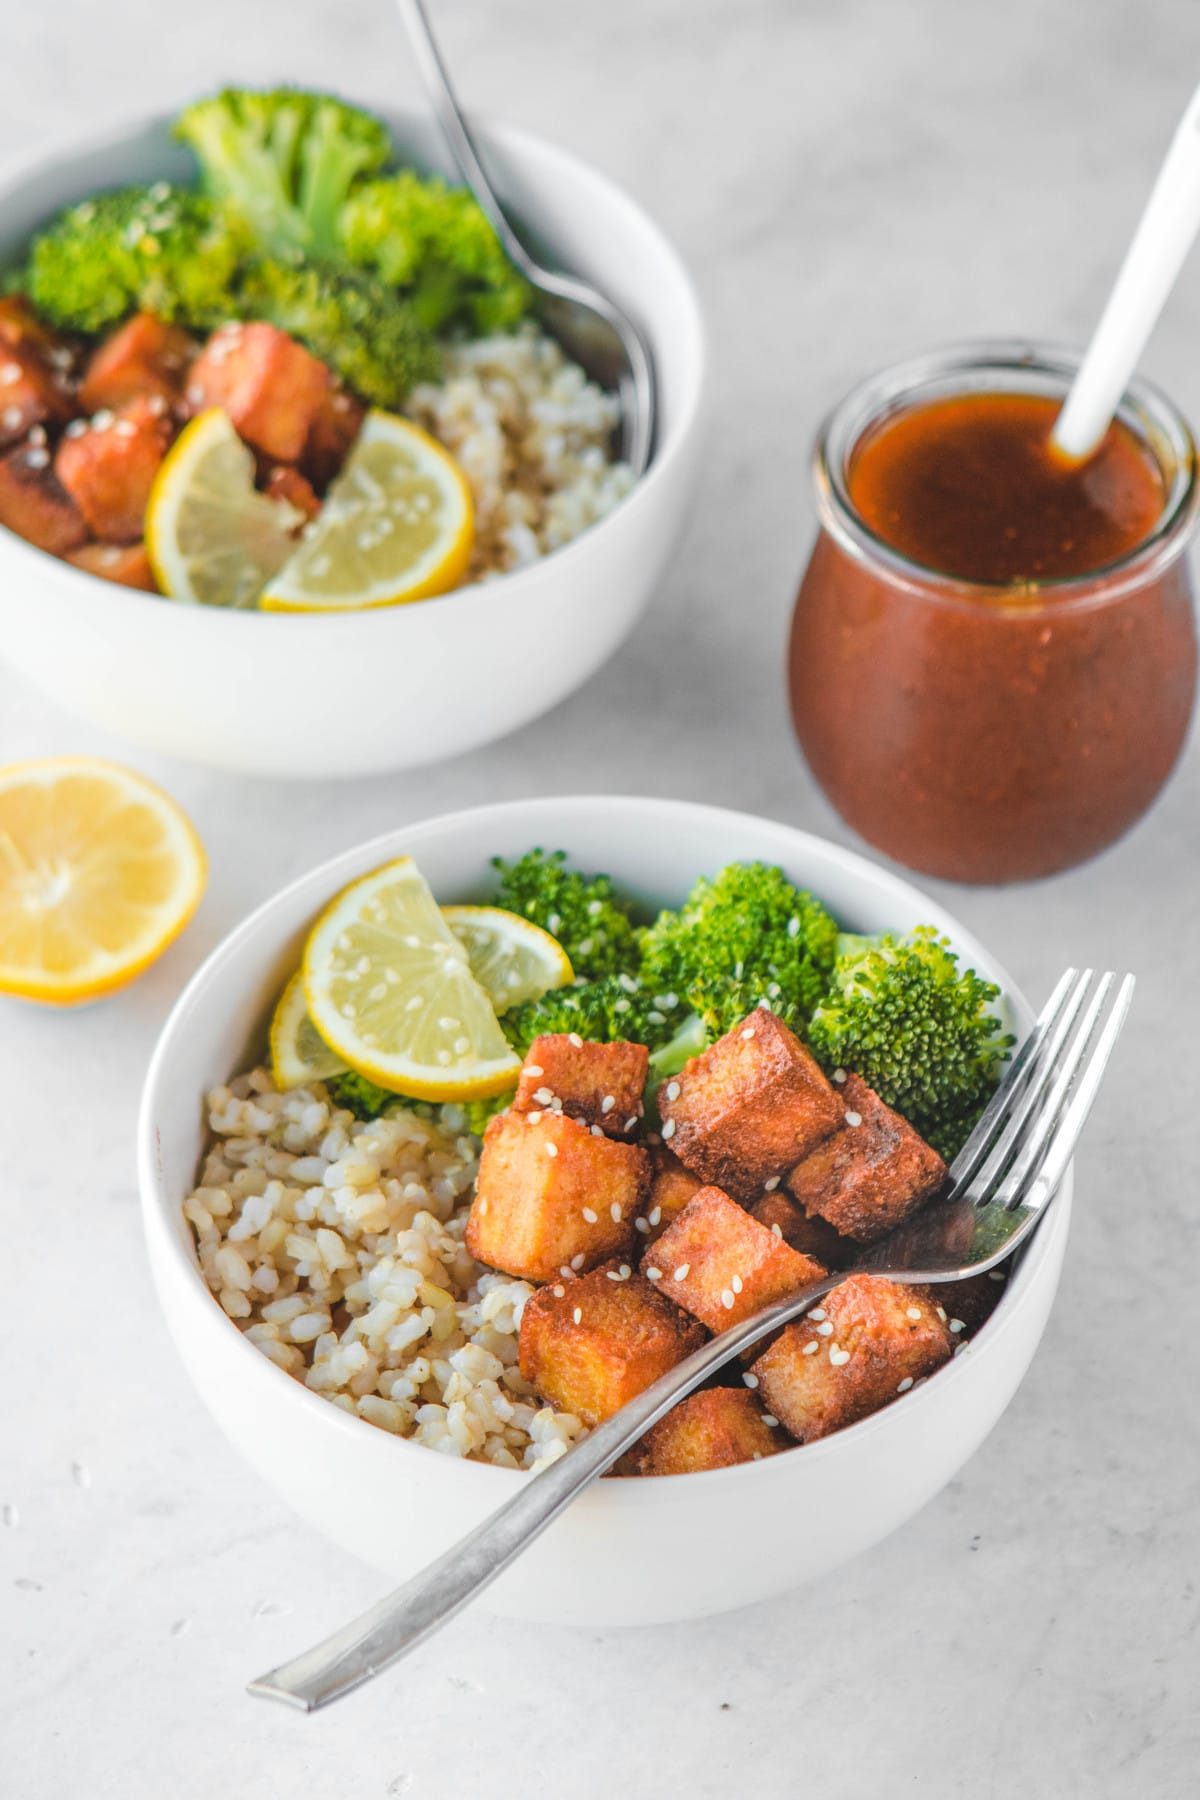 orange tofu bowls with orange sauce